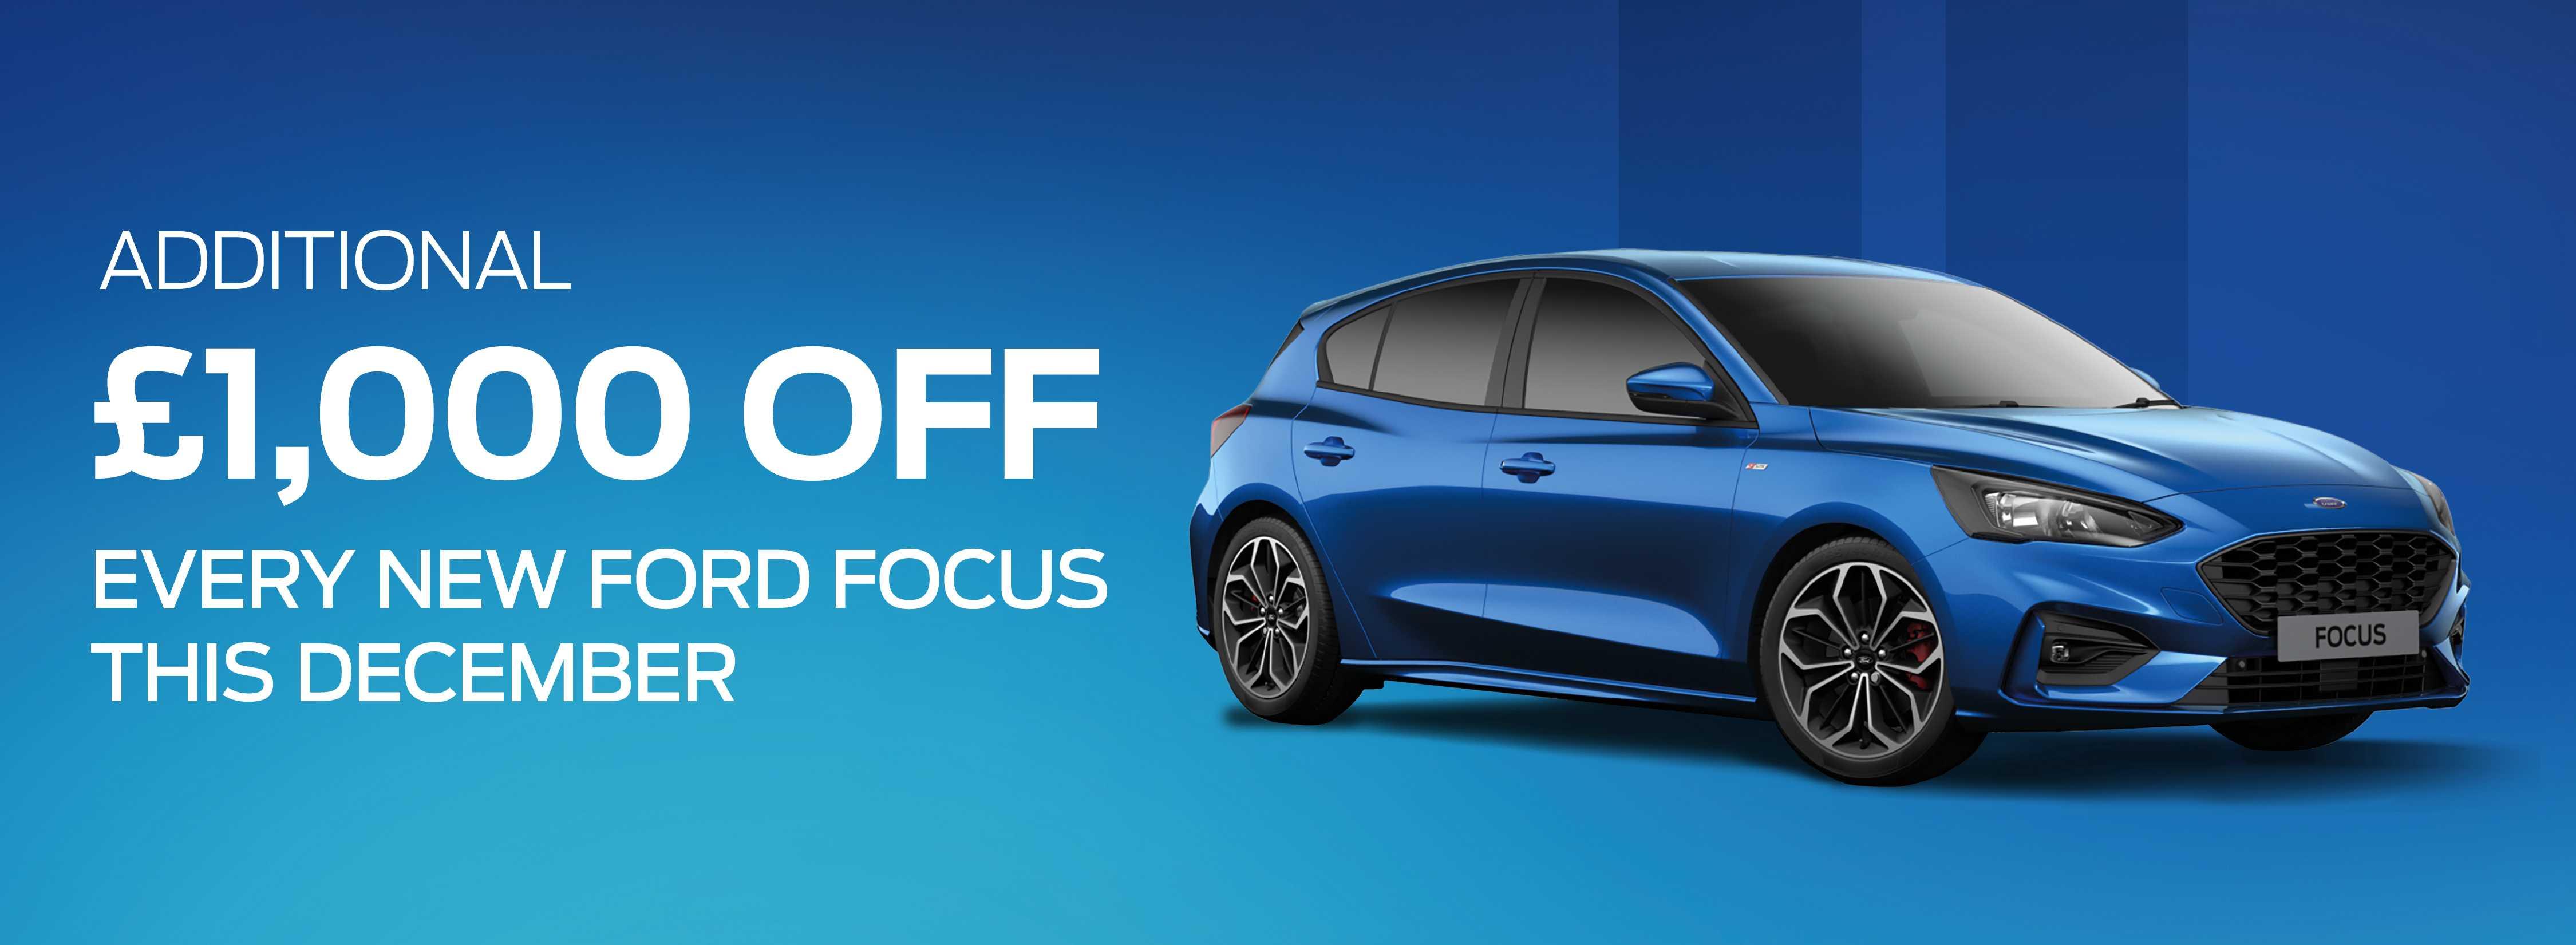 Ford Focus December Offer Banner